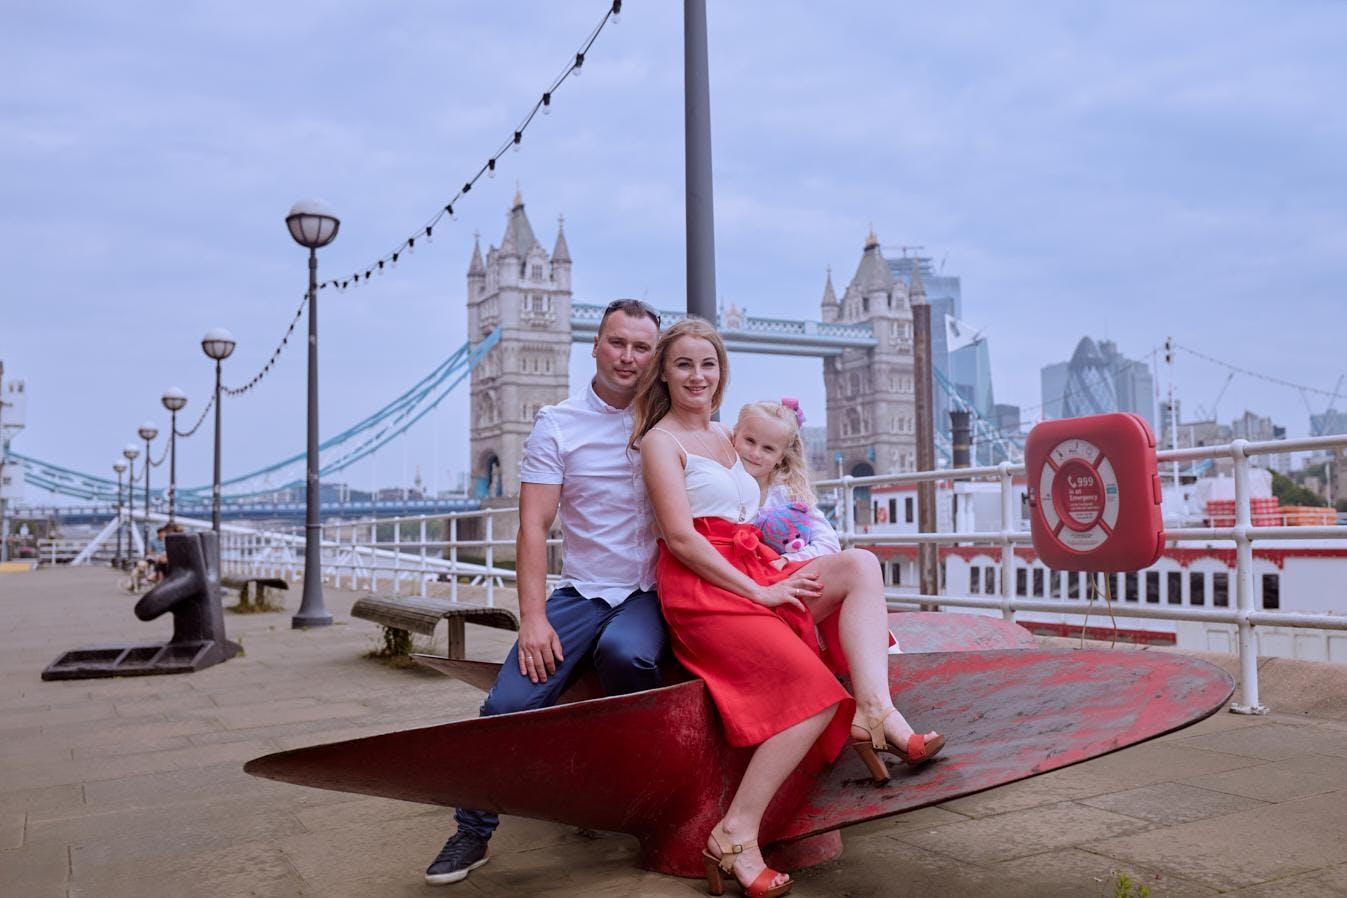 Professional Photo Session at London Tower Bridge